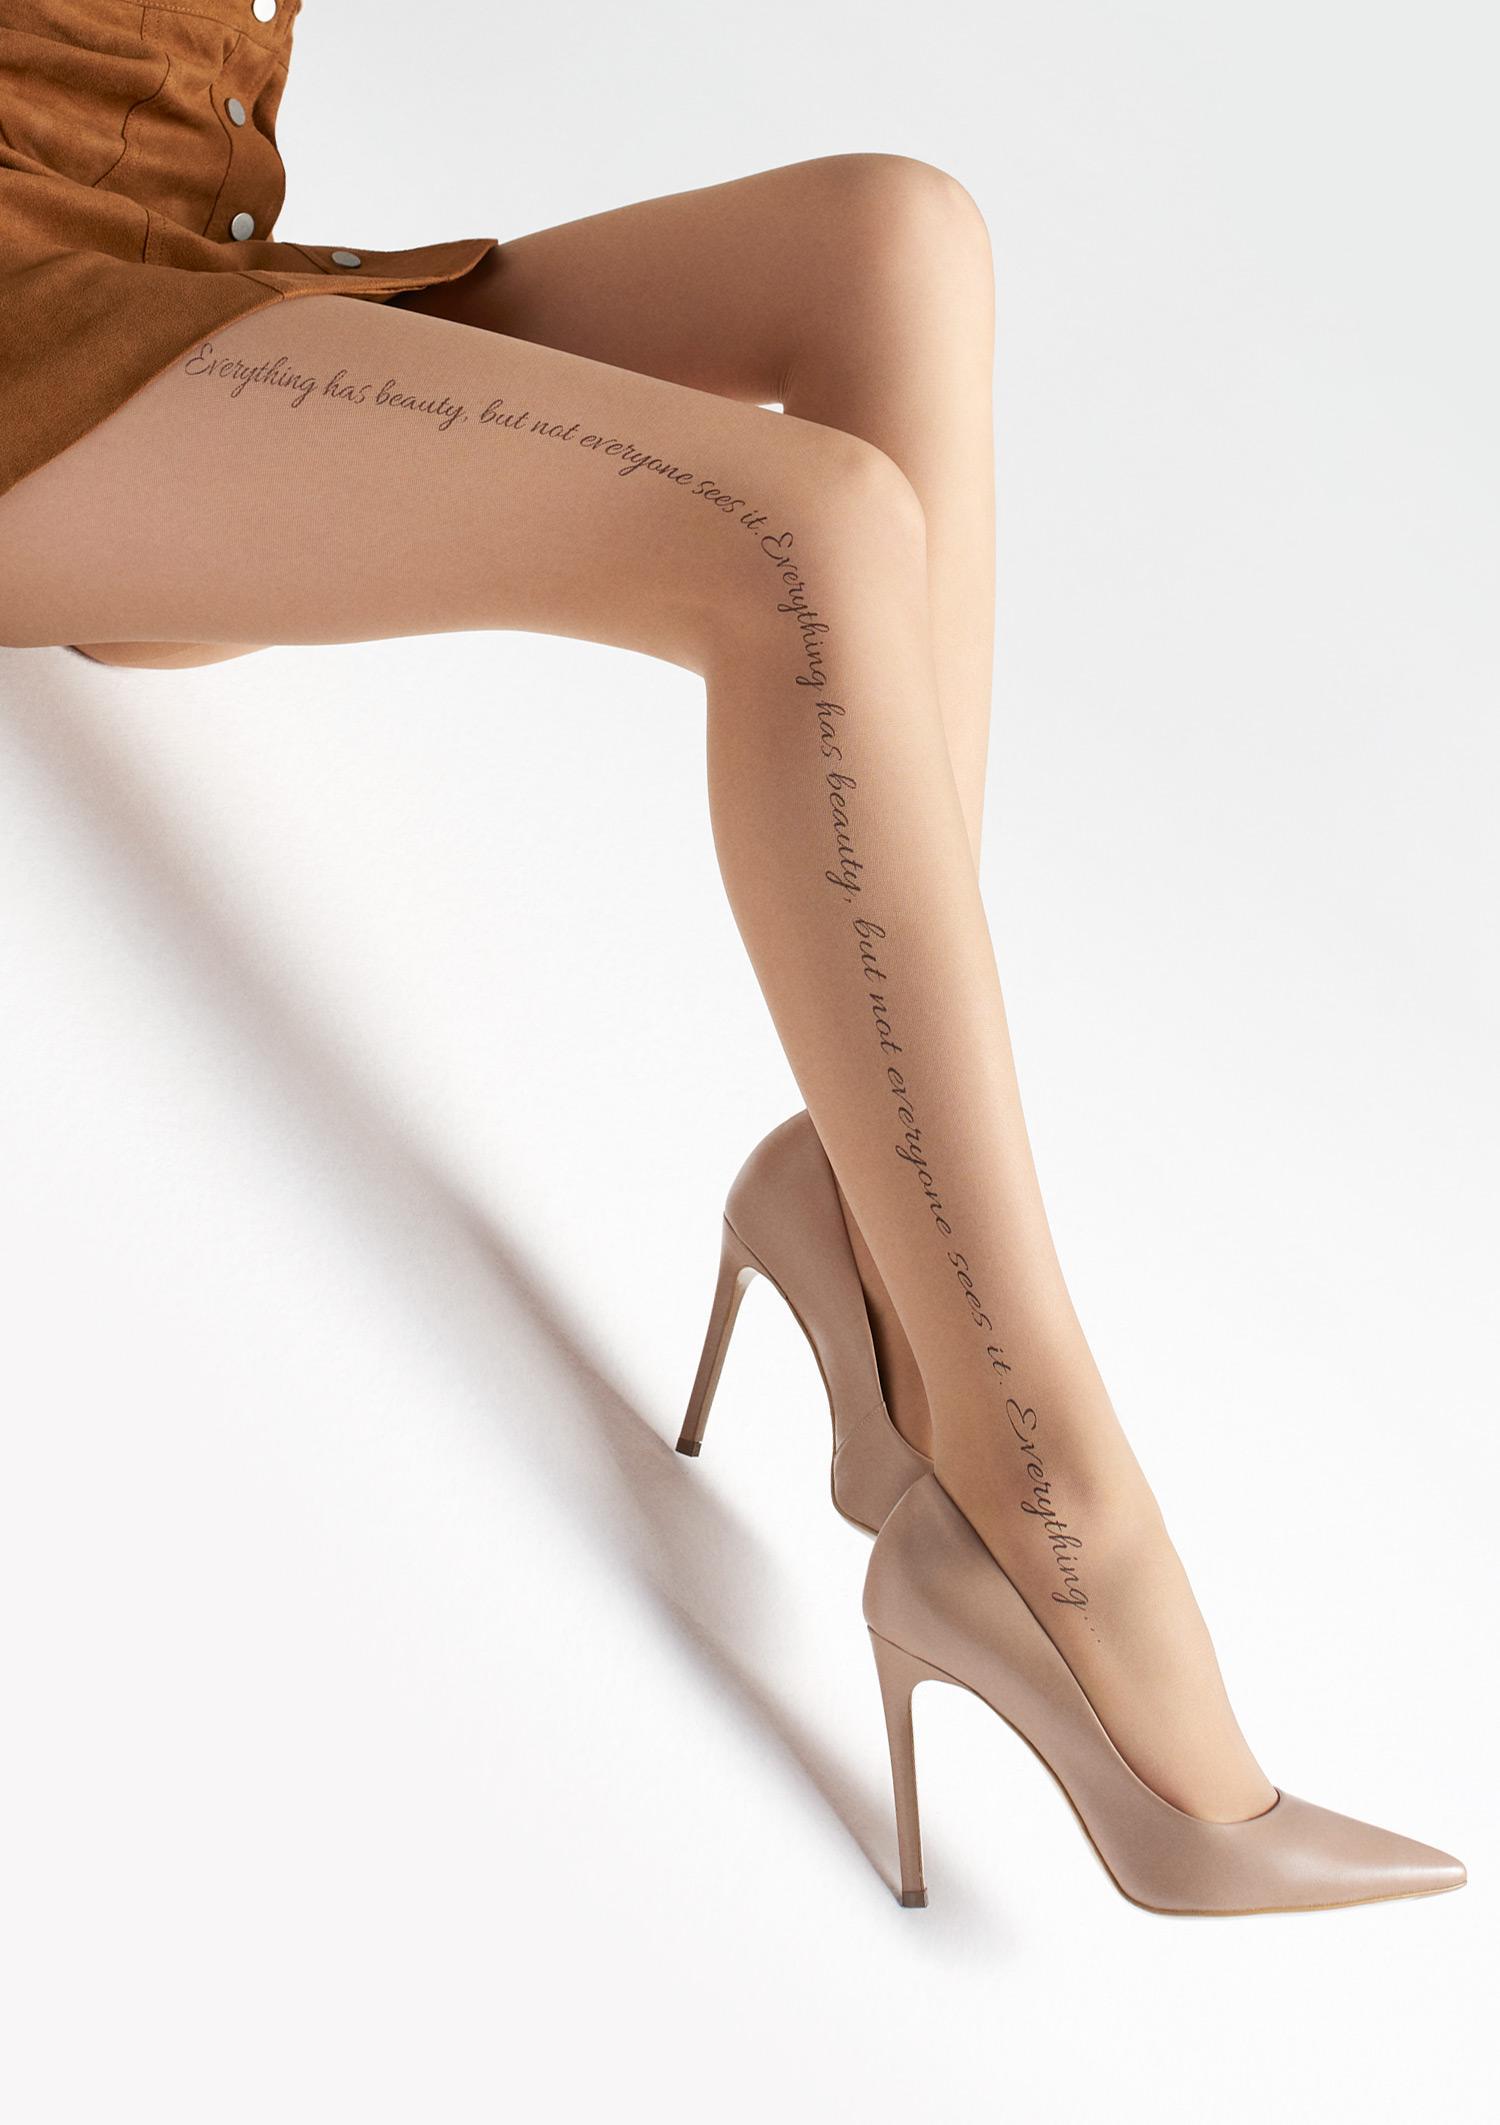 https://golden-legs.com.ua/images/stories/virtuemart/product/gladkie-rajstopy-z-napisem-po-boku-emmy-u02-marilyn_2.jpg